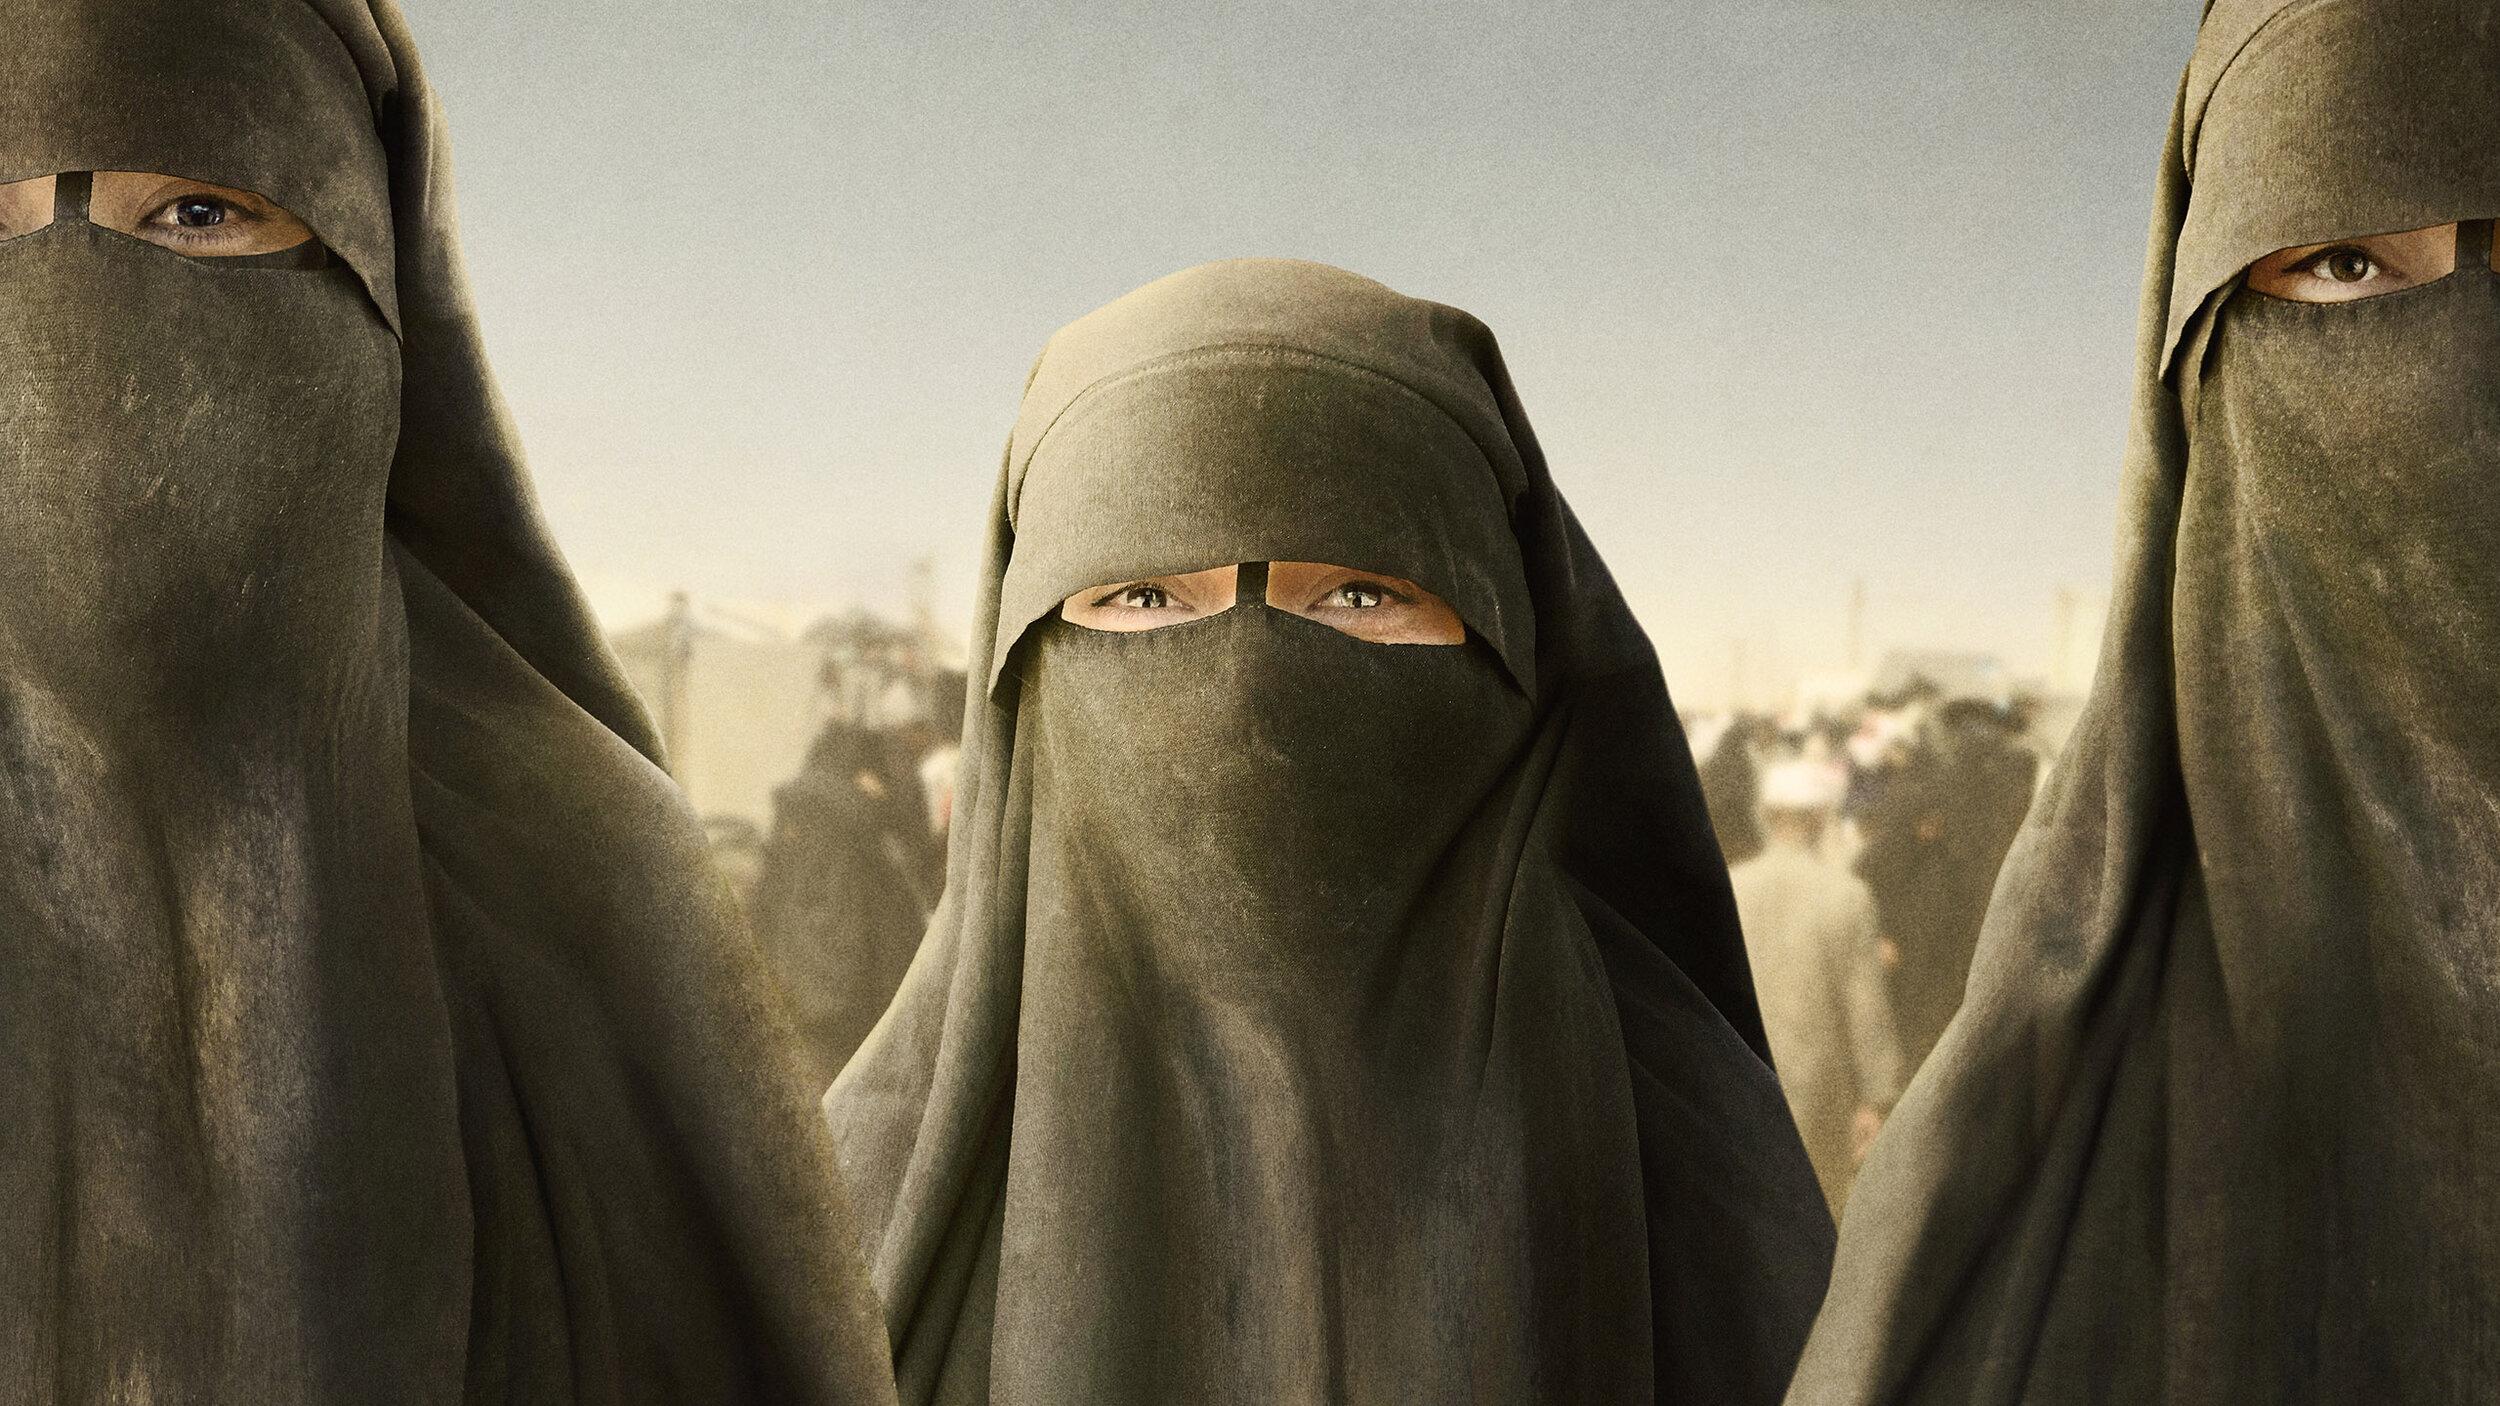 Movie poster image for SABAYA